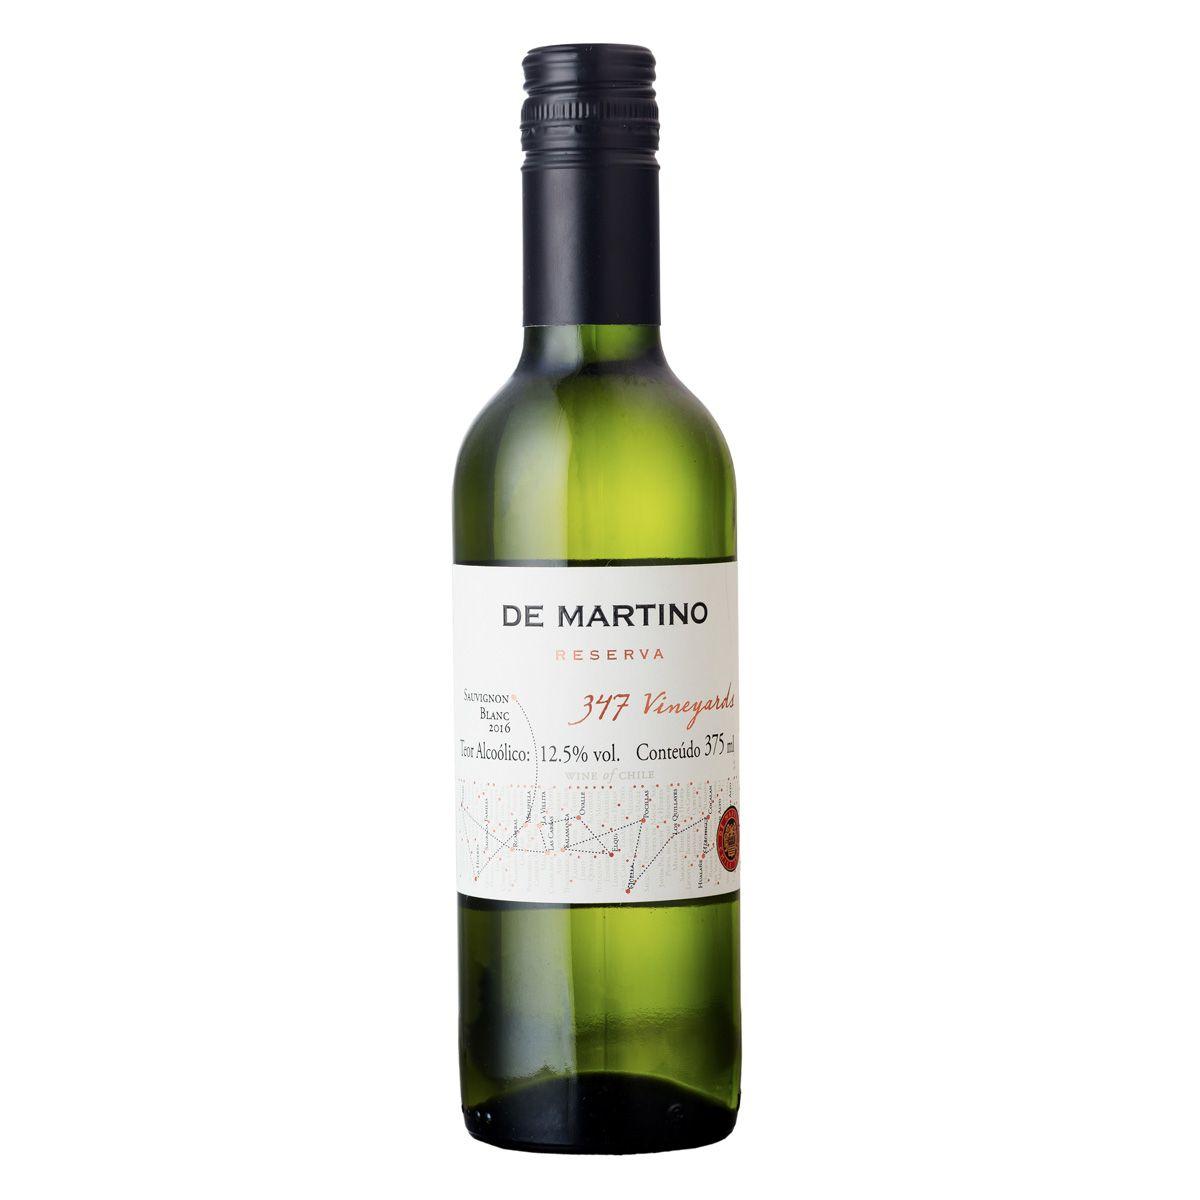 De Martino Sauvignon Blanc Reserva 347 Vineyards 375ml